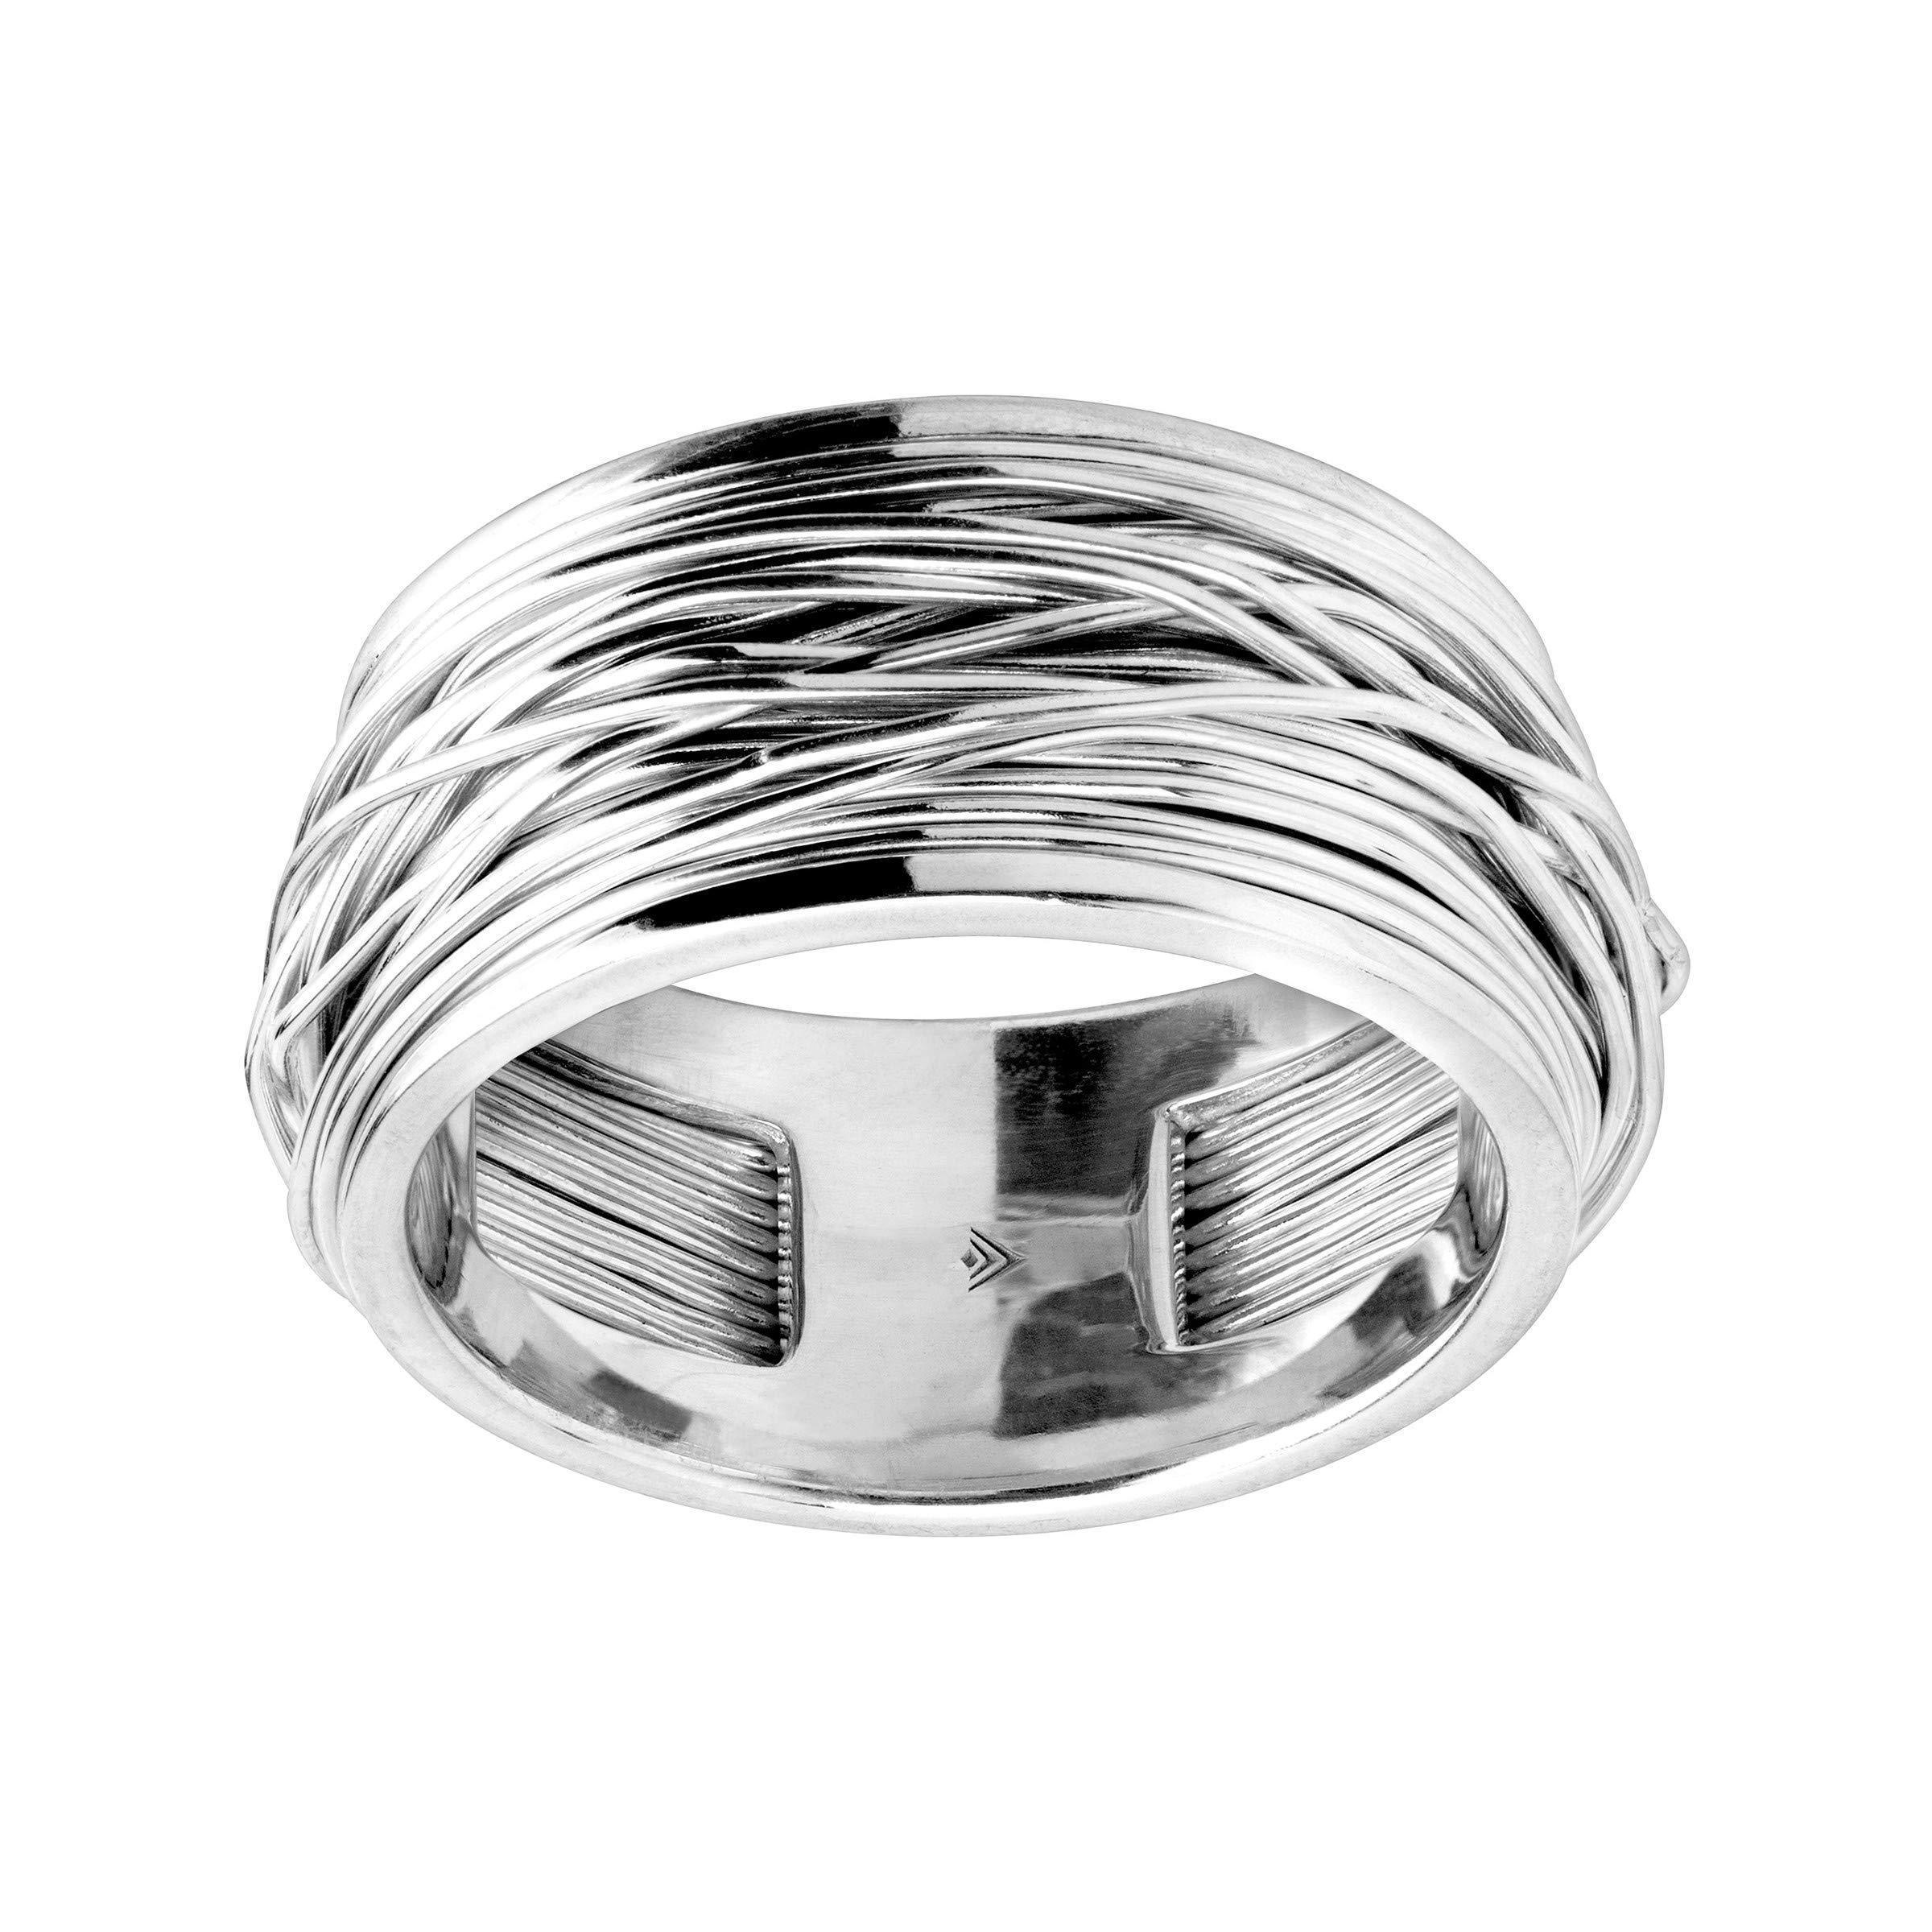 Silpada 'Aegean' Crisscross Band Ring in Sterling Silver